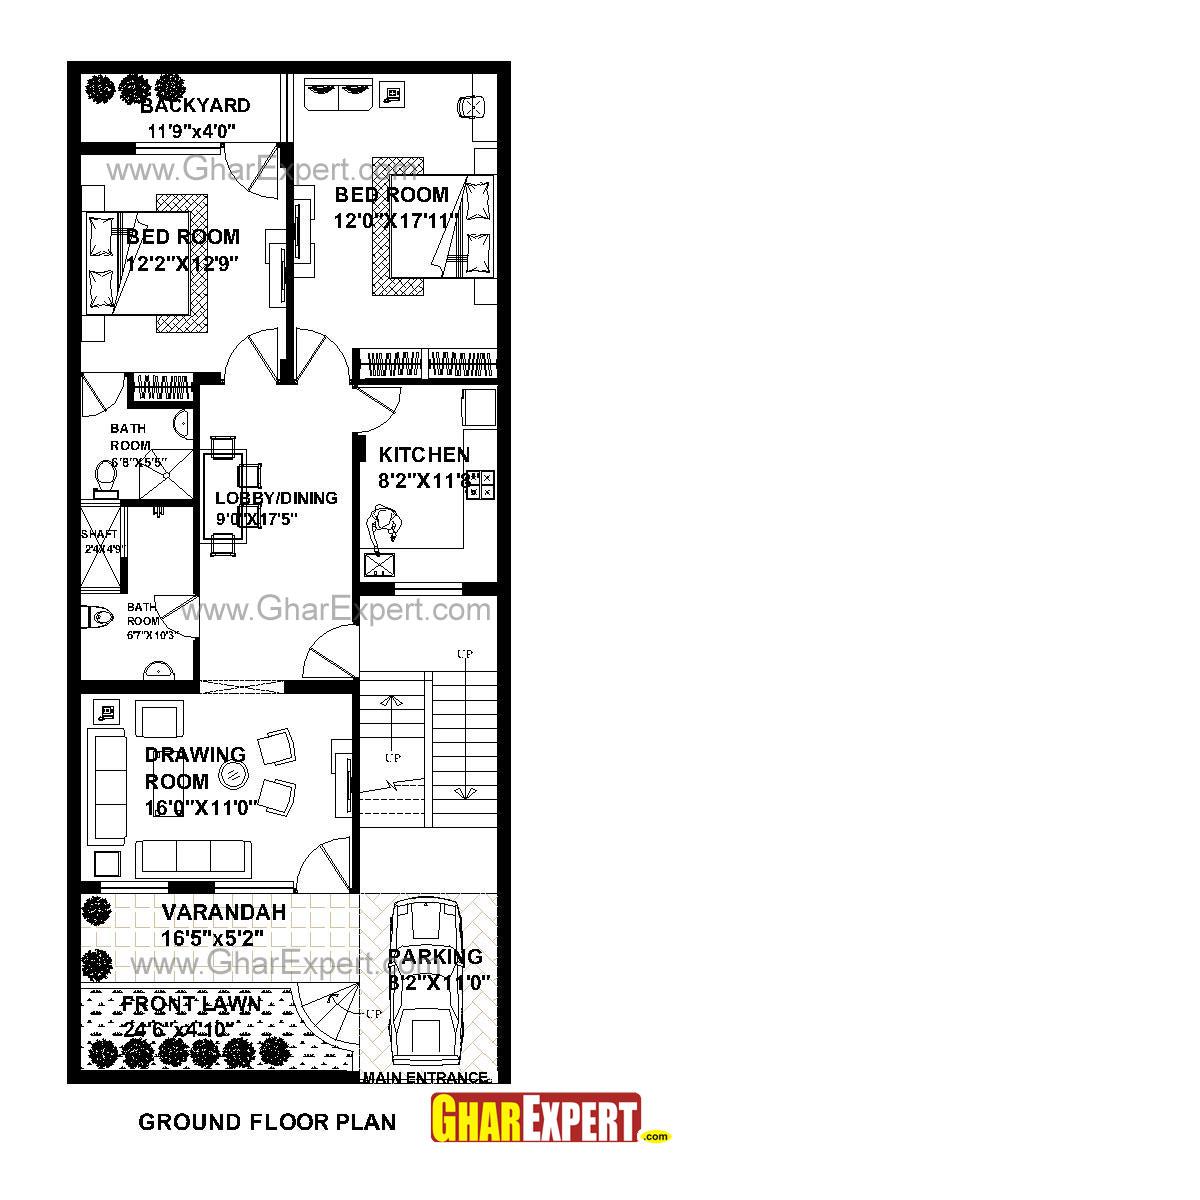 House Plan for 26 Feet by 60 Feet plot (Plot Size 173